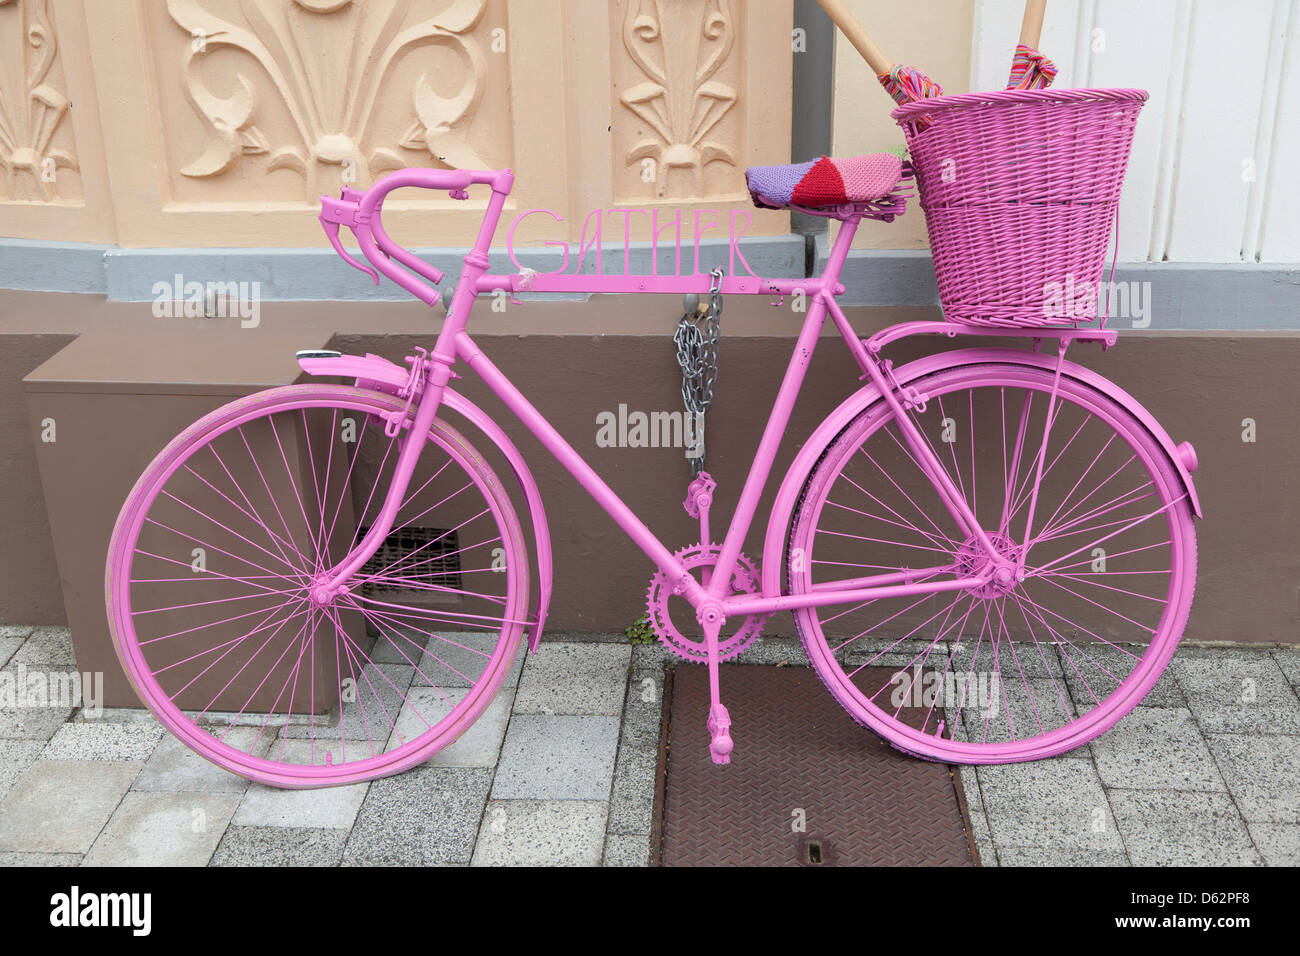 Rosa lackierten Bike als Werbung in Napier, Neuseeland Stockbild